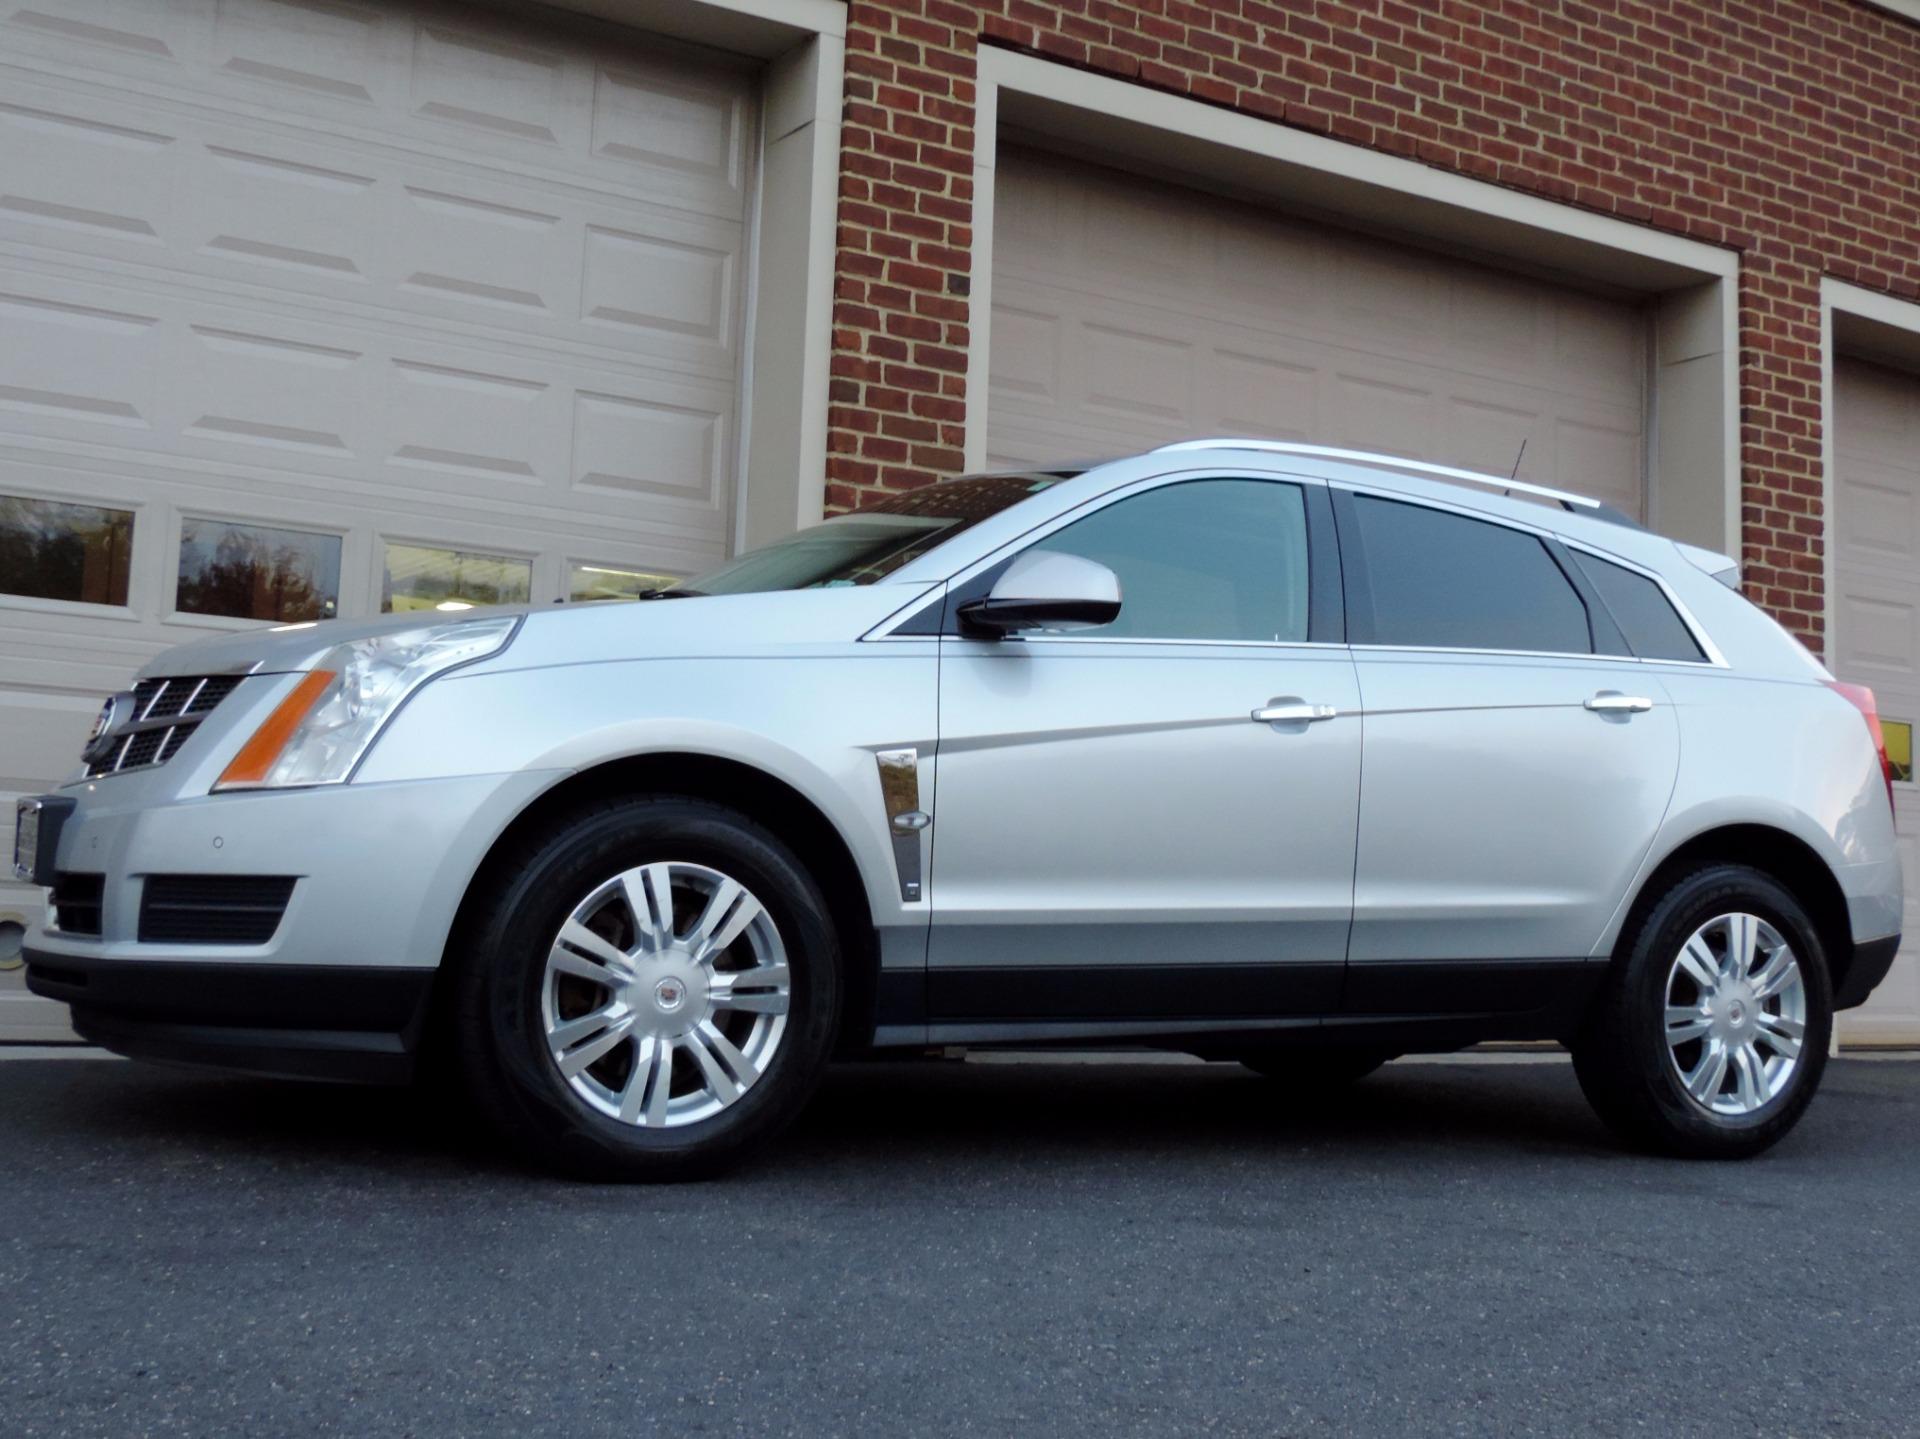 Cadillac Dealers Nj >> 2012 Cadillac SRX Luxury Collection Stock # 650582 for sale near Edgewater Park, NJ | NJ ...